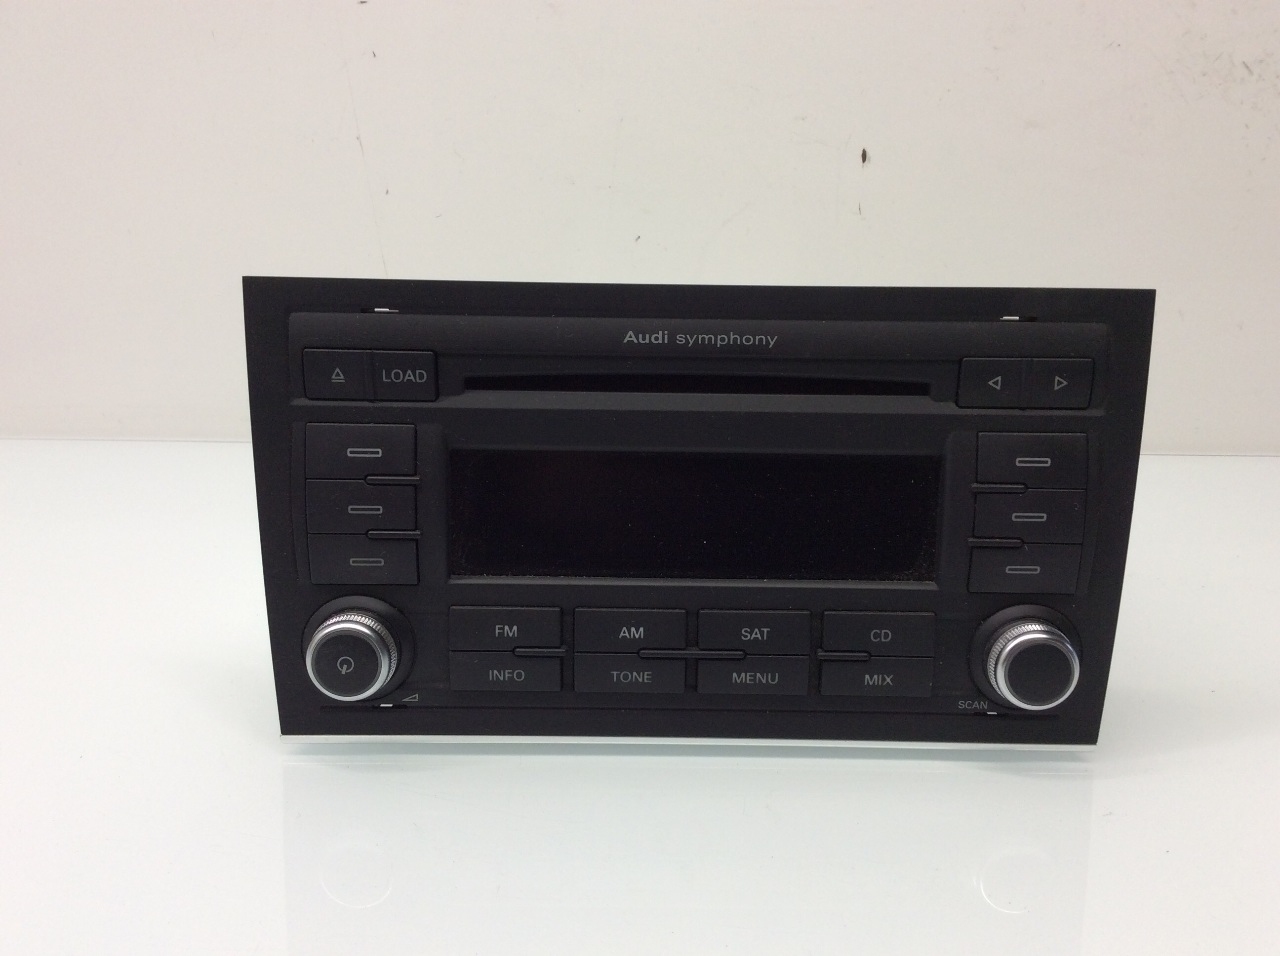 2006 2007 2008 audi a4 s4 radio stereo cd player symphony. Black Bedroom Furniture Sets. Home Design Ideas